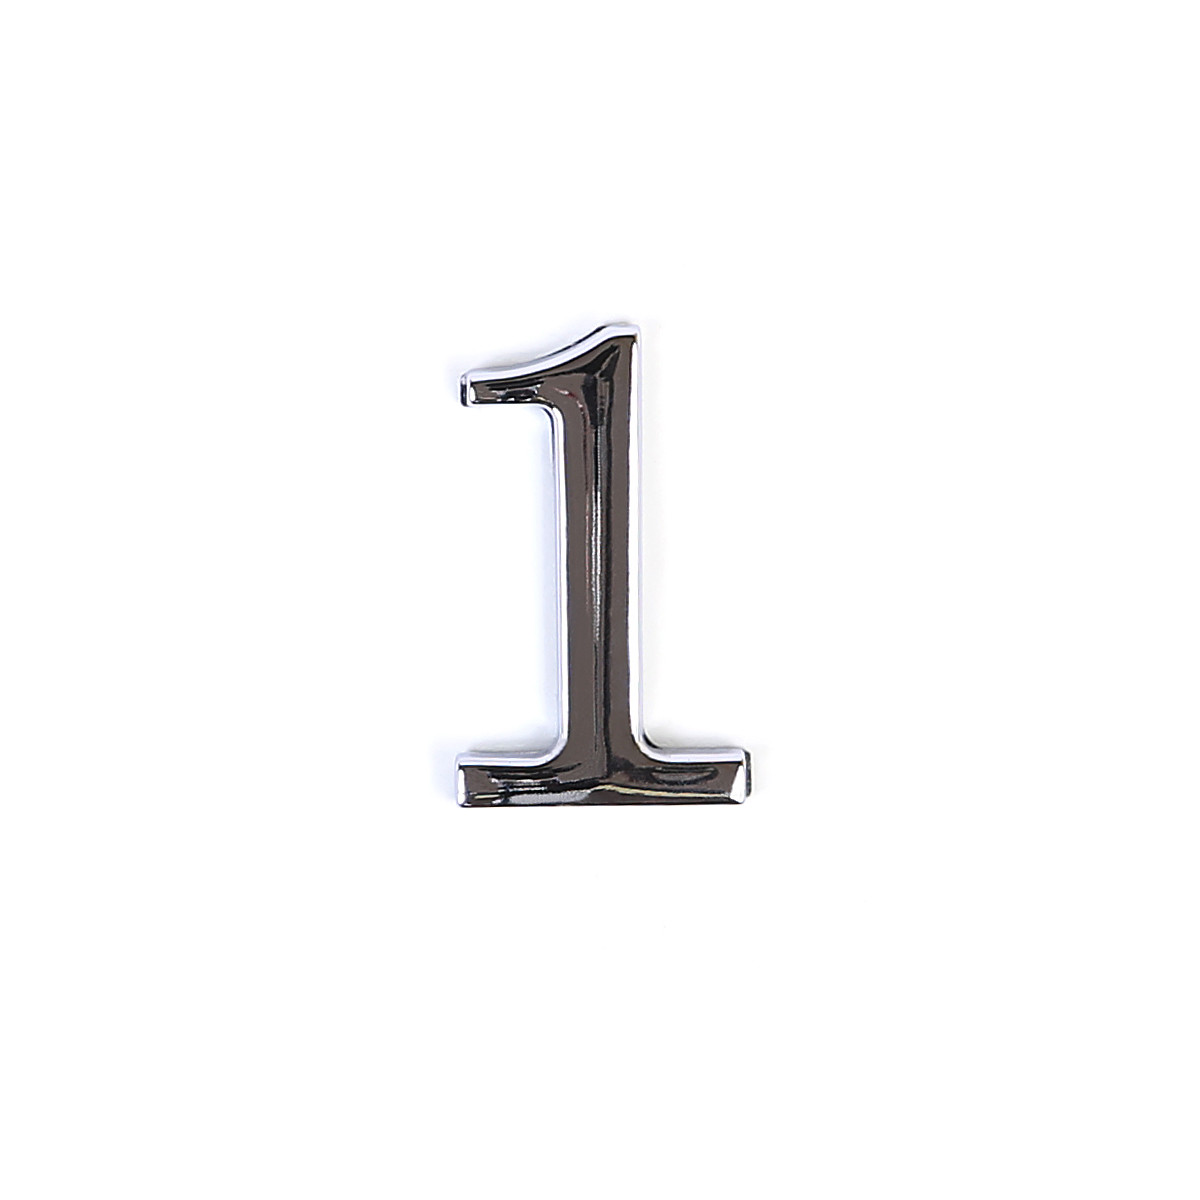 Номер на дверь из цинка Larvij цифра 1 Хром (LNZ4 CP #1)